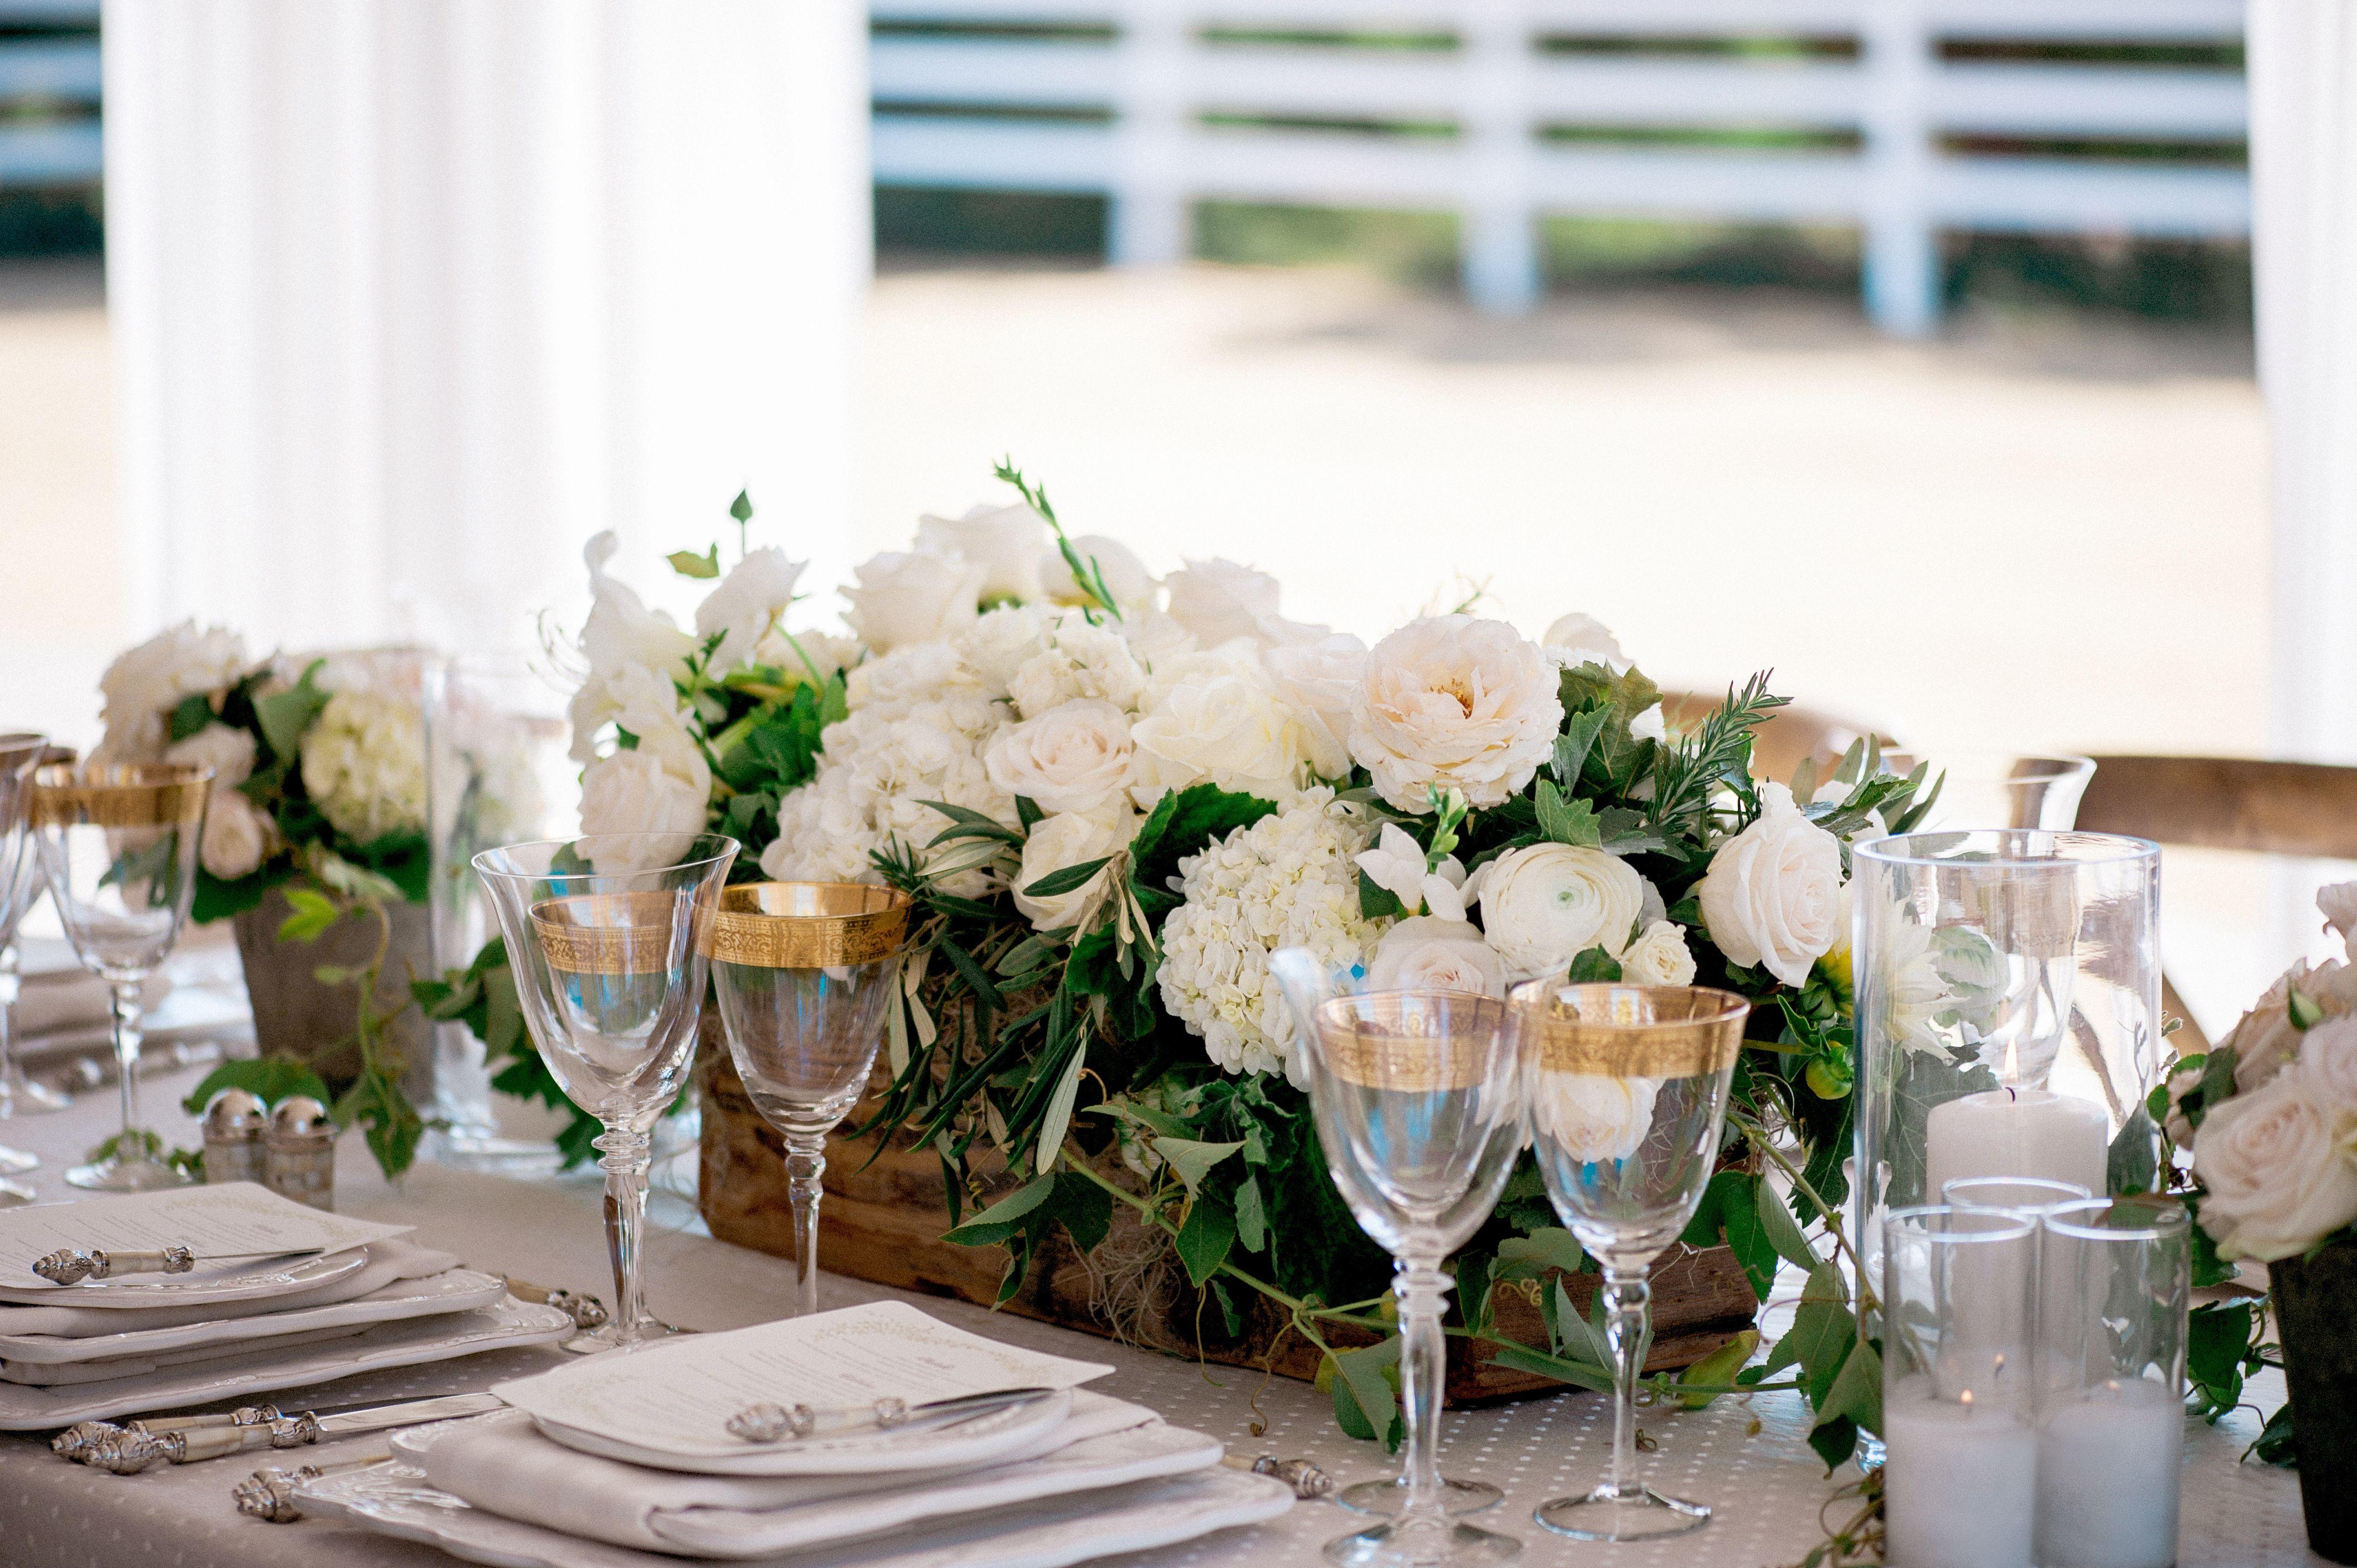 Ivory Flower and Greenery Centerpiece | Wedding | Pinterest ...